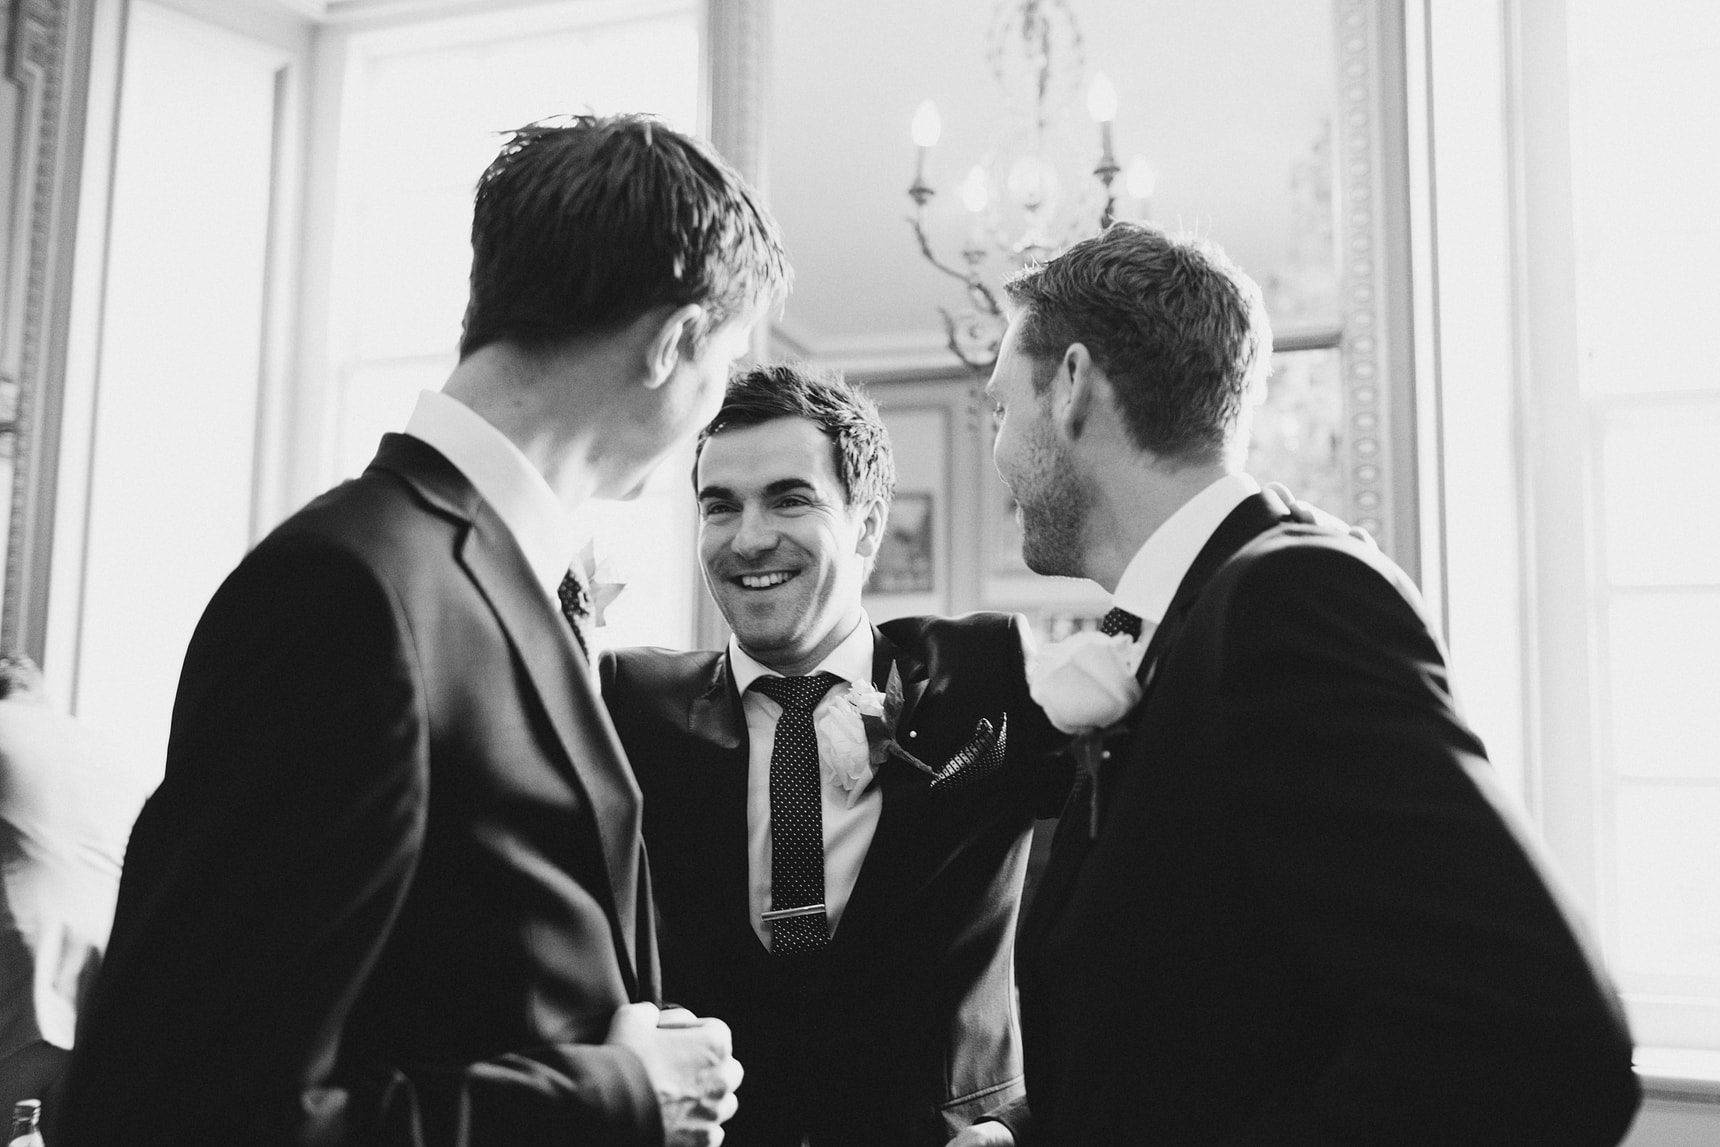 anstey hall cambridge wedding